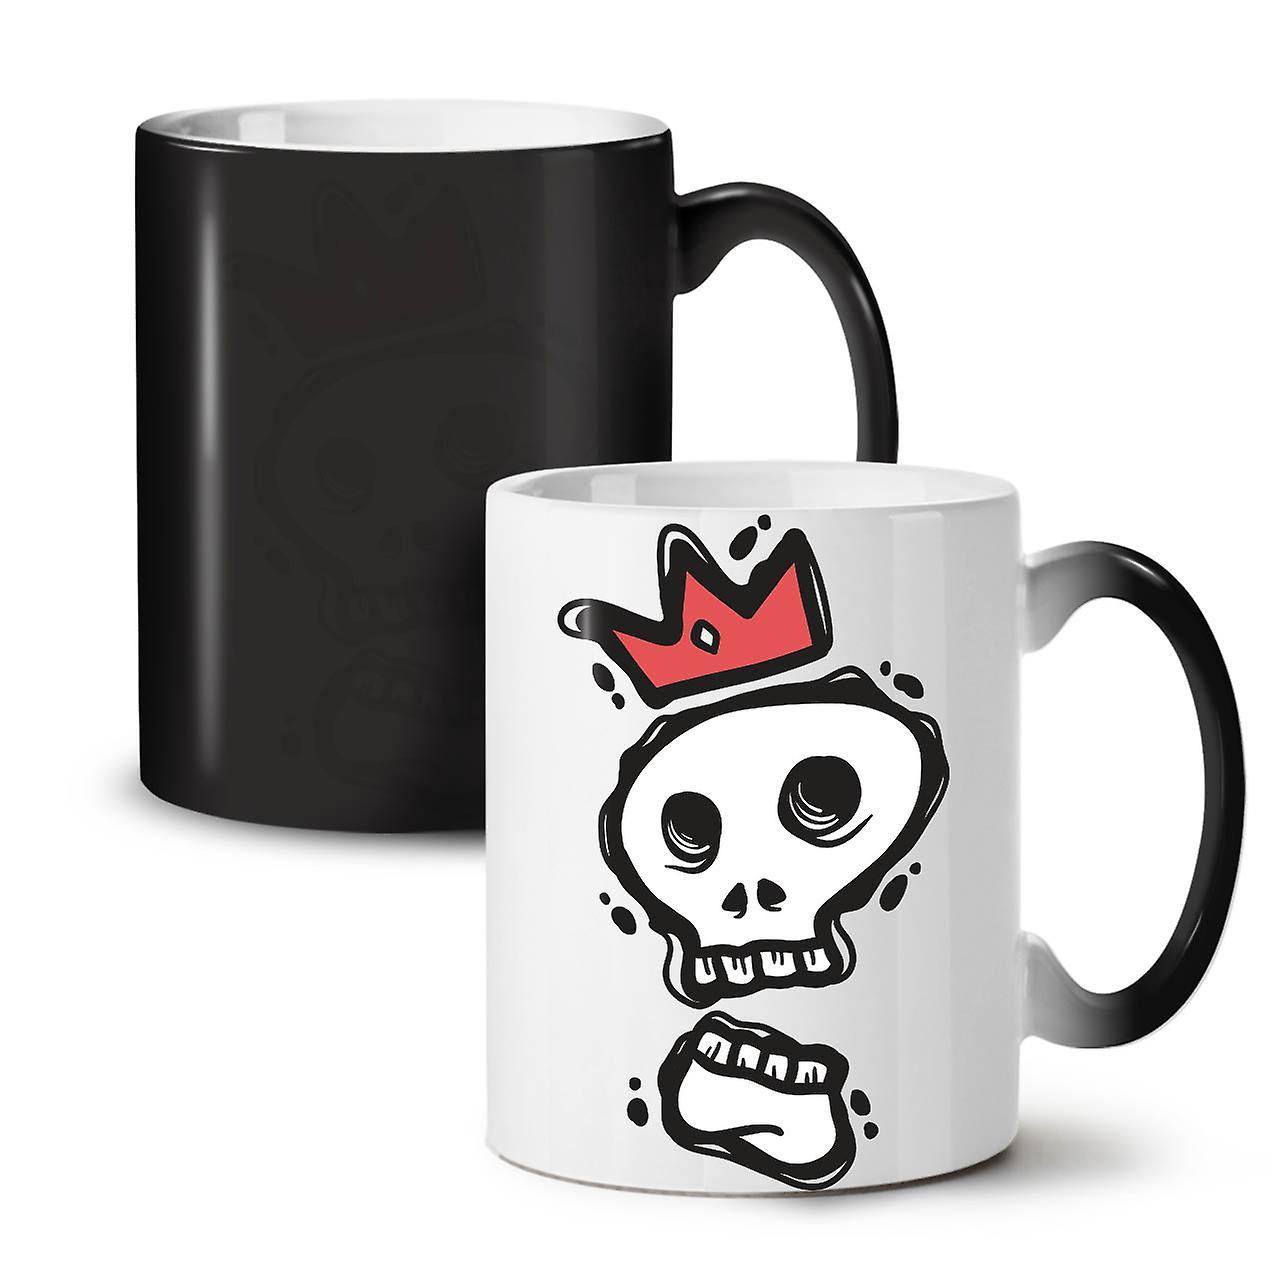 Of Ceramic 11 The OzWellcoda King Coffee New Colour Changing Mug Black Skull Tea PXiTwOkZu